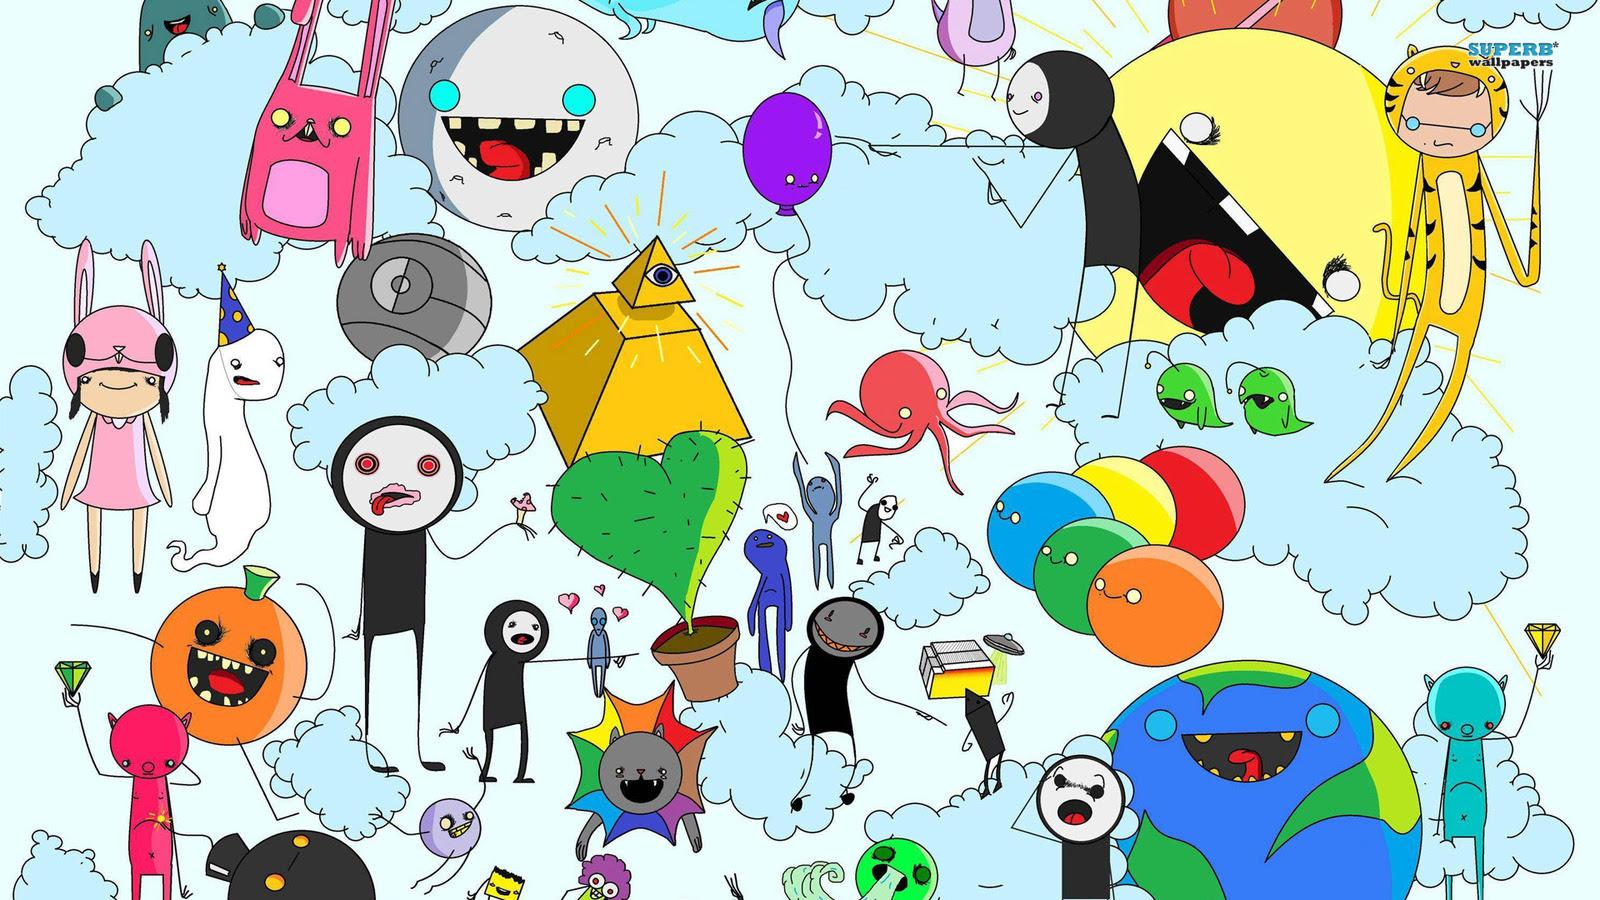 Download 7700 Wallpaper Dinding Cartoon HD Paling Keren